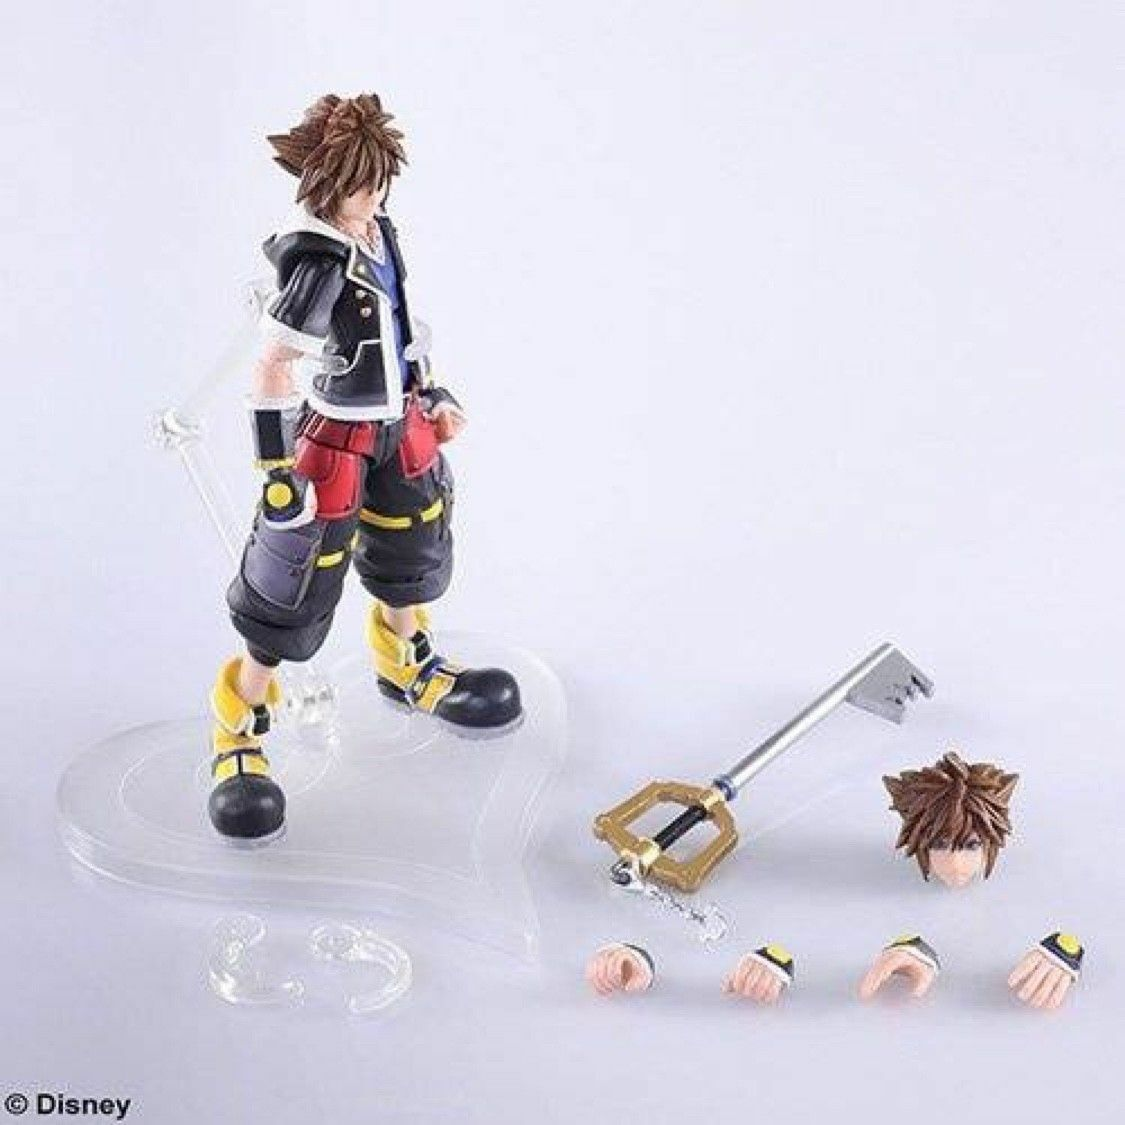 Kingdom Hearts 3 Sora Bring Arts Action Action Action Figure D23 Expo not Bandai SH Figuarts 815409